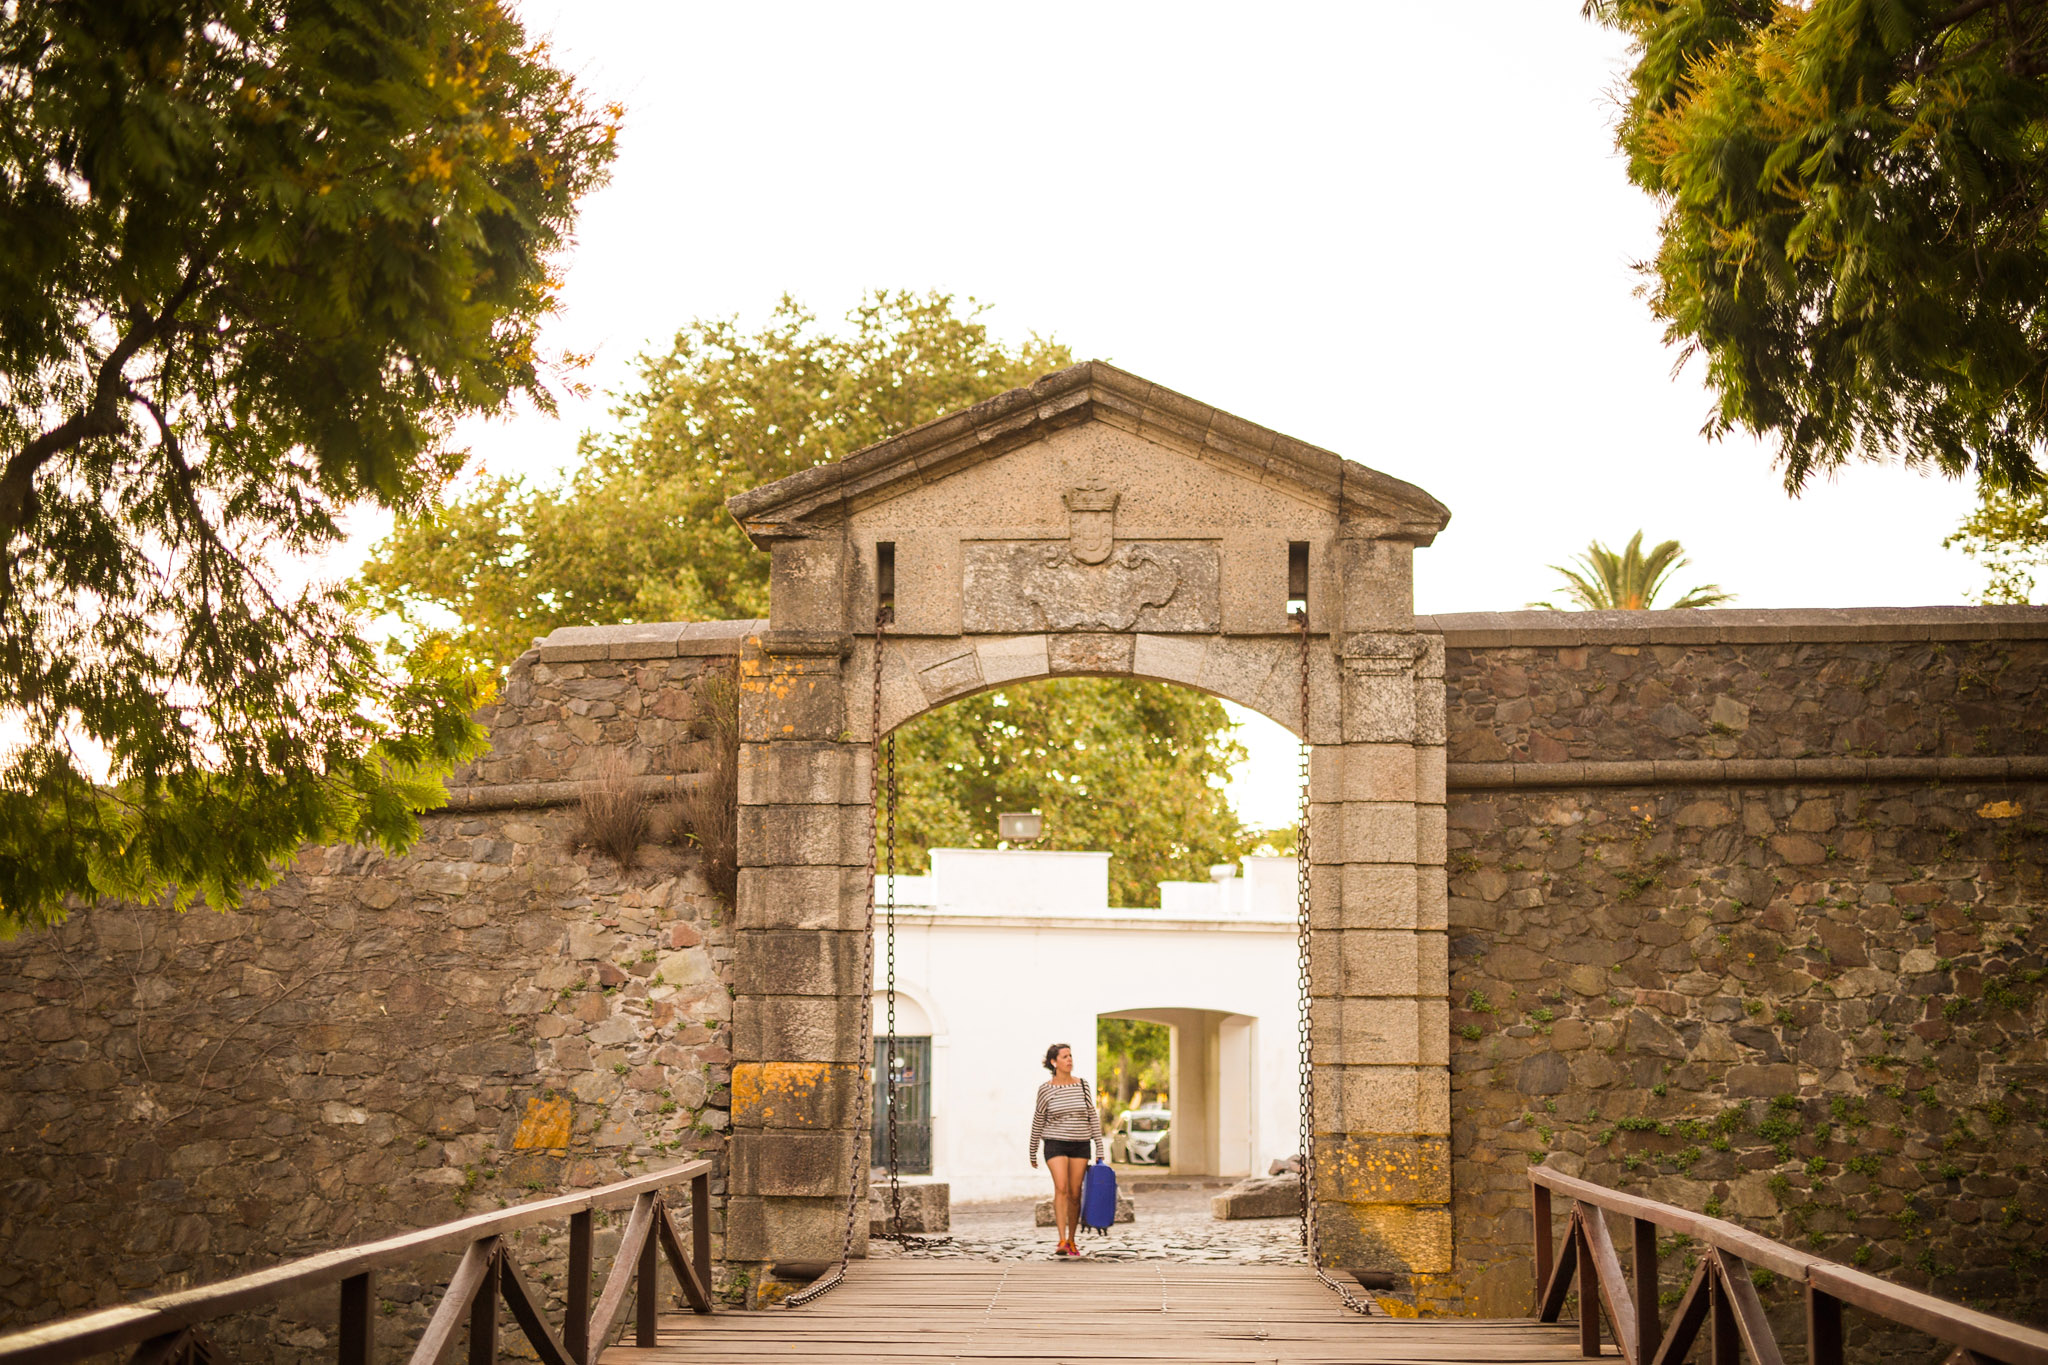 wedding-travellers-destination-photography-overlanding-south-america-uruguay-colonia-del-sacramento-gate